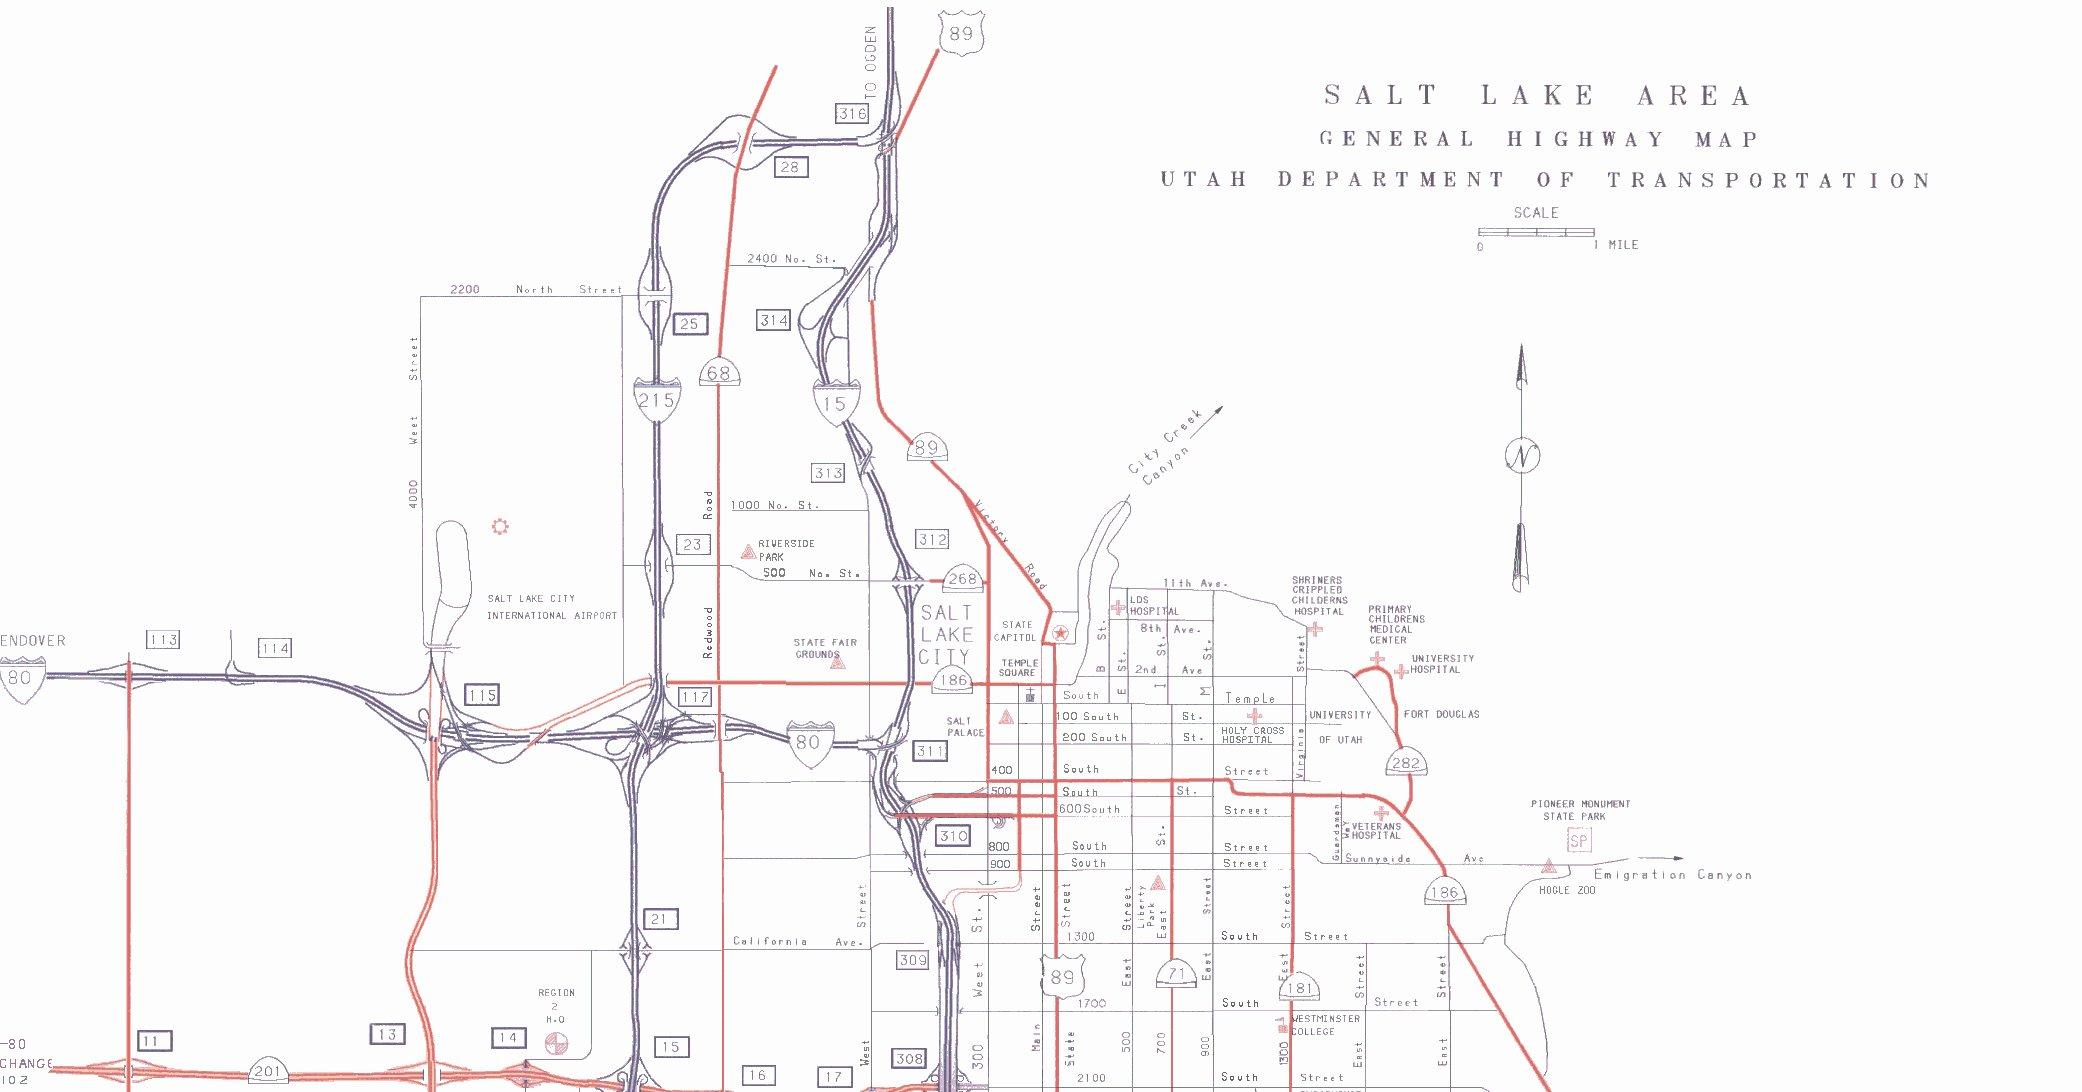 Va Hospital Utah Map.Salt Lake City Utah Map